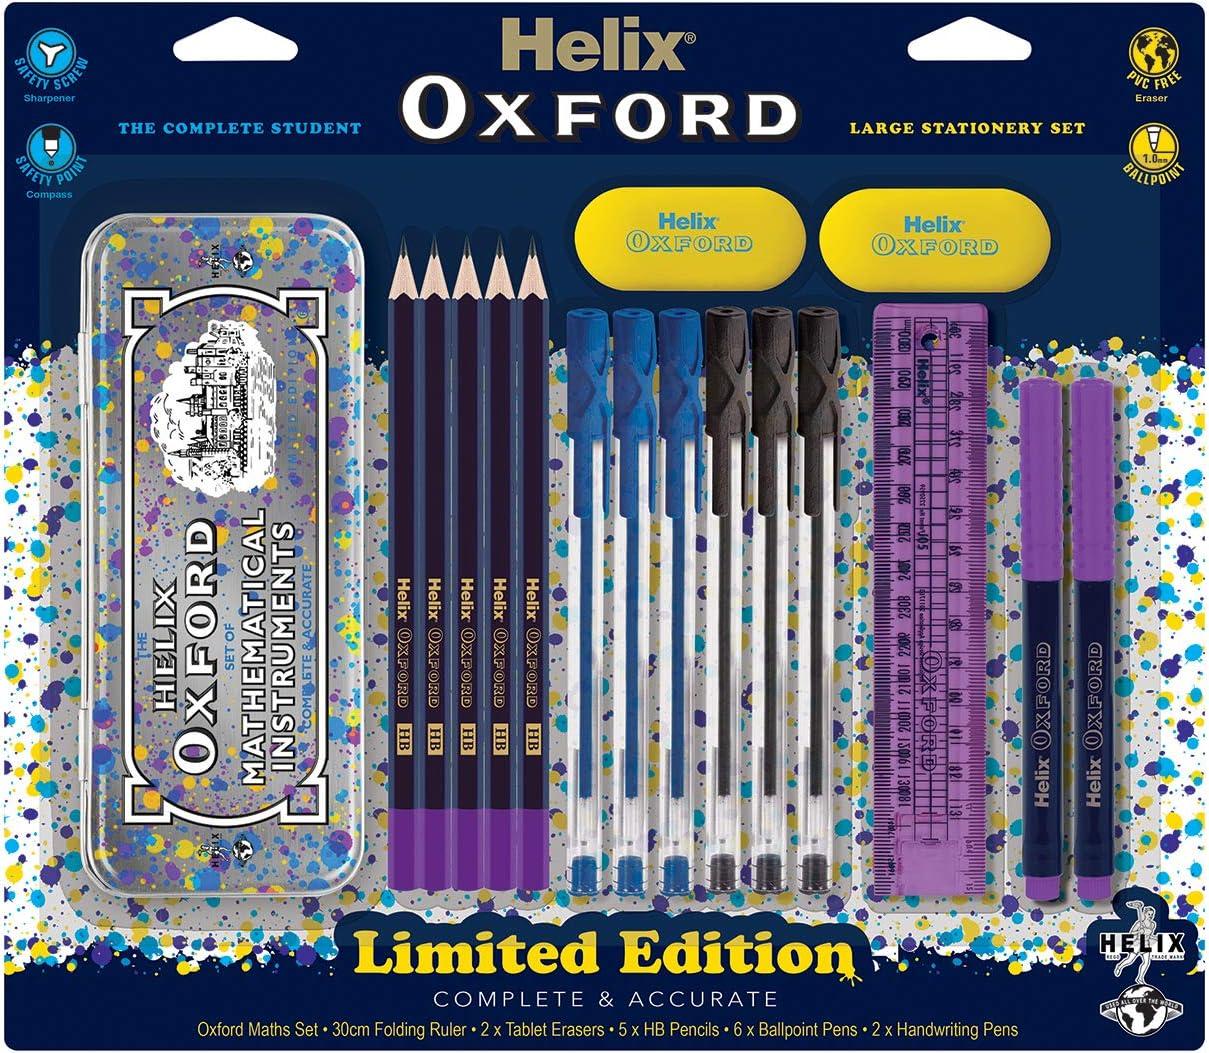 Pen Metal Compass /& Geometry Set Pencils Helix BASIC Stationary//School Set